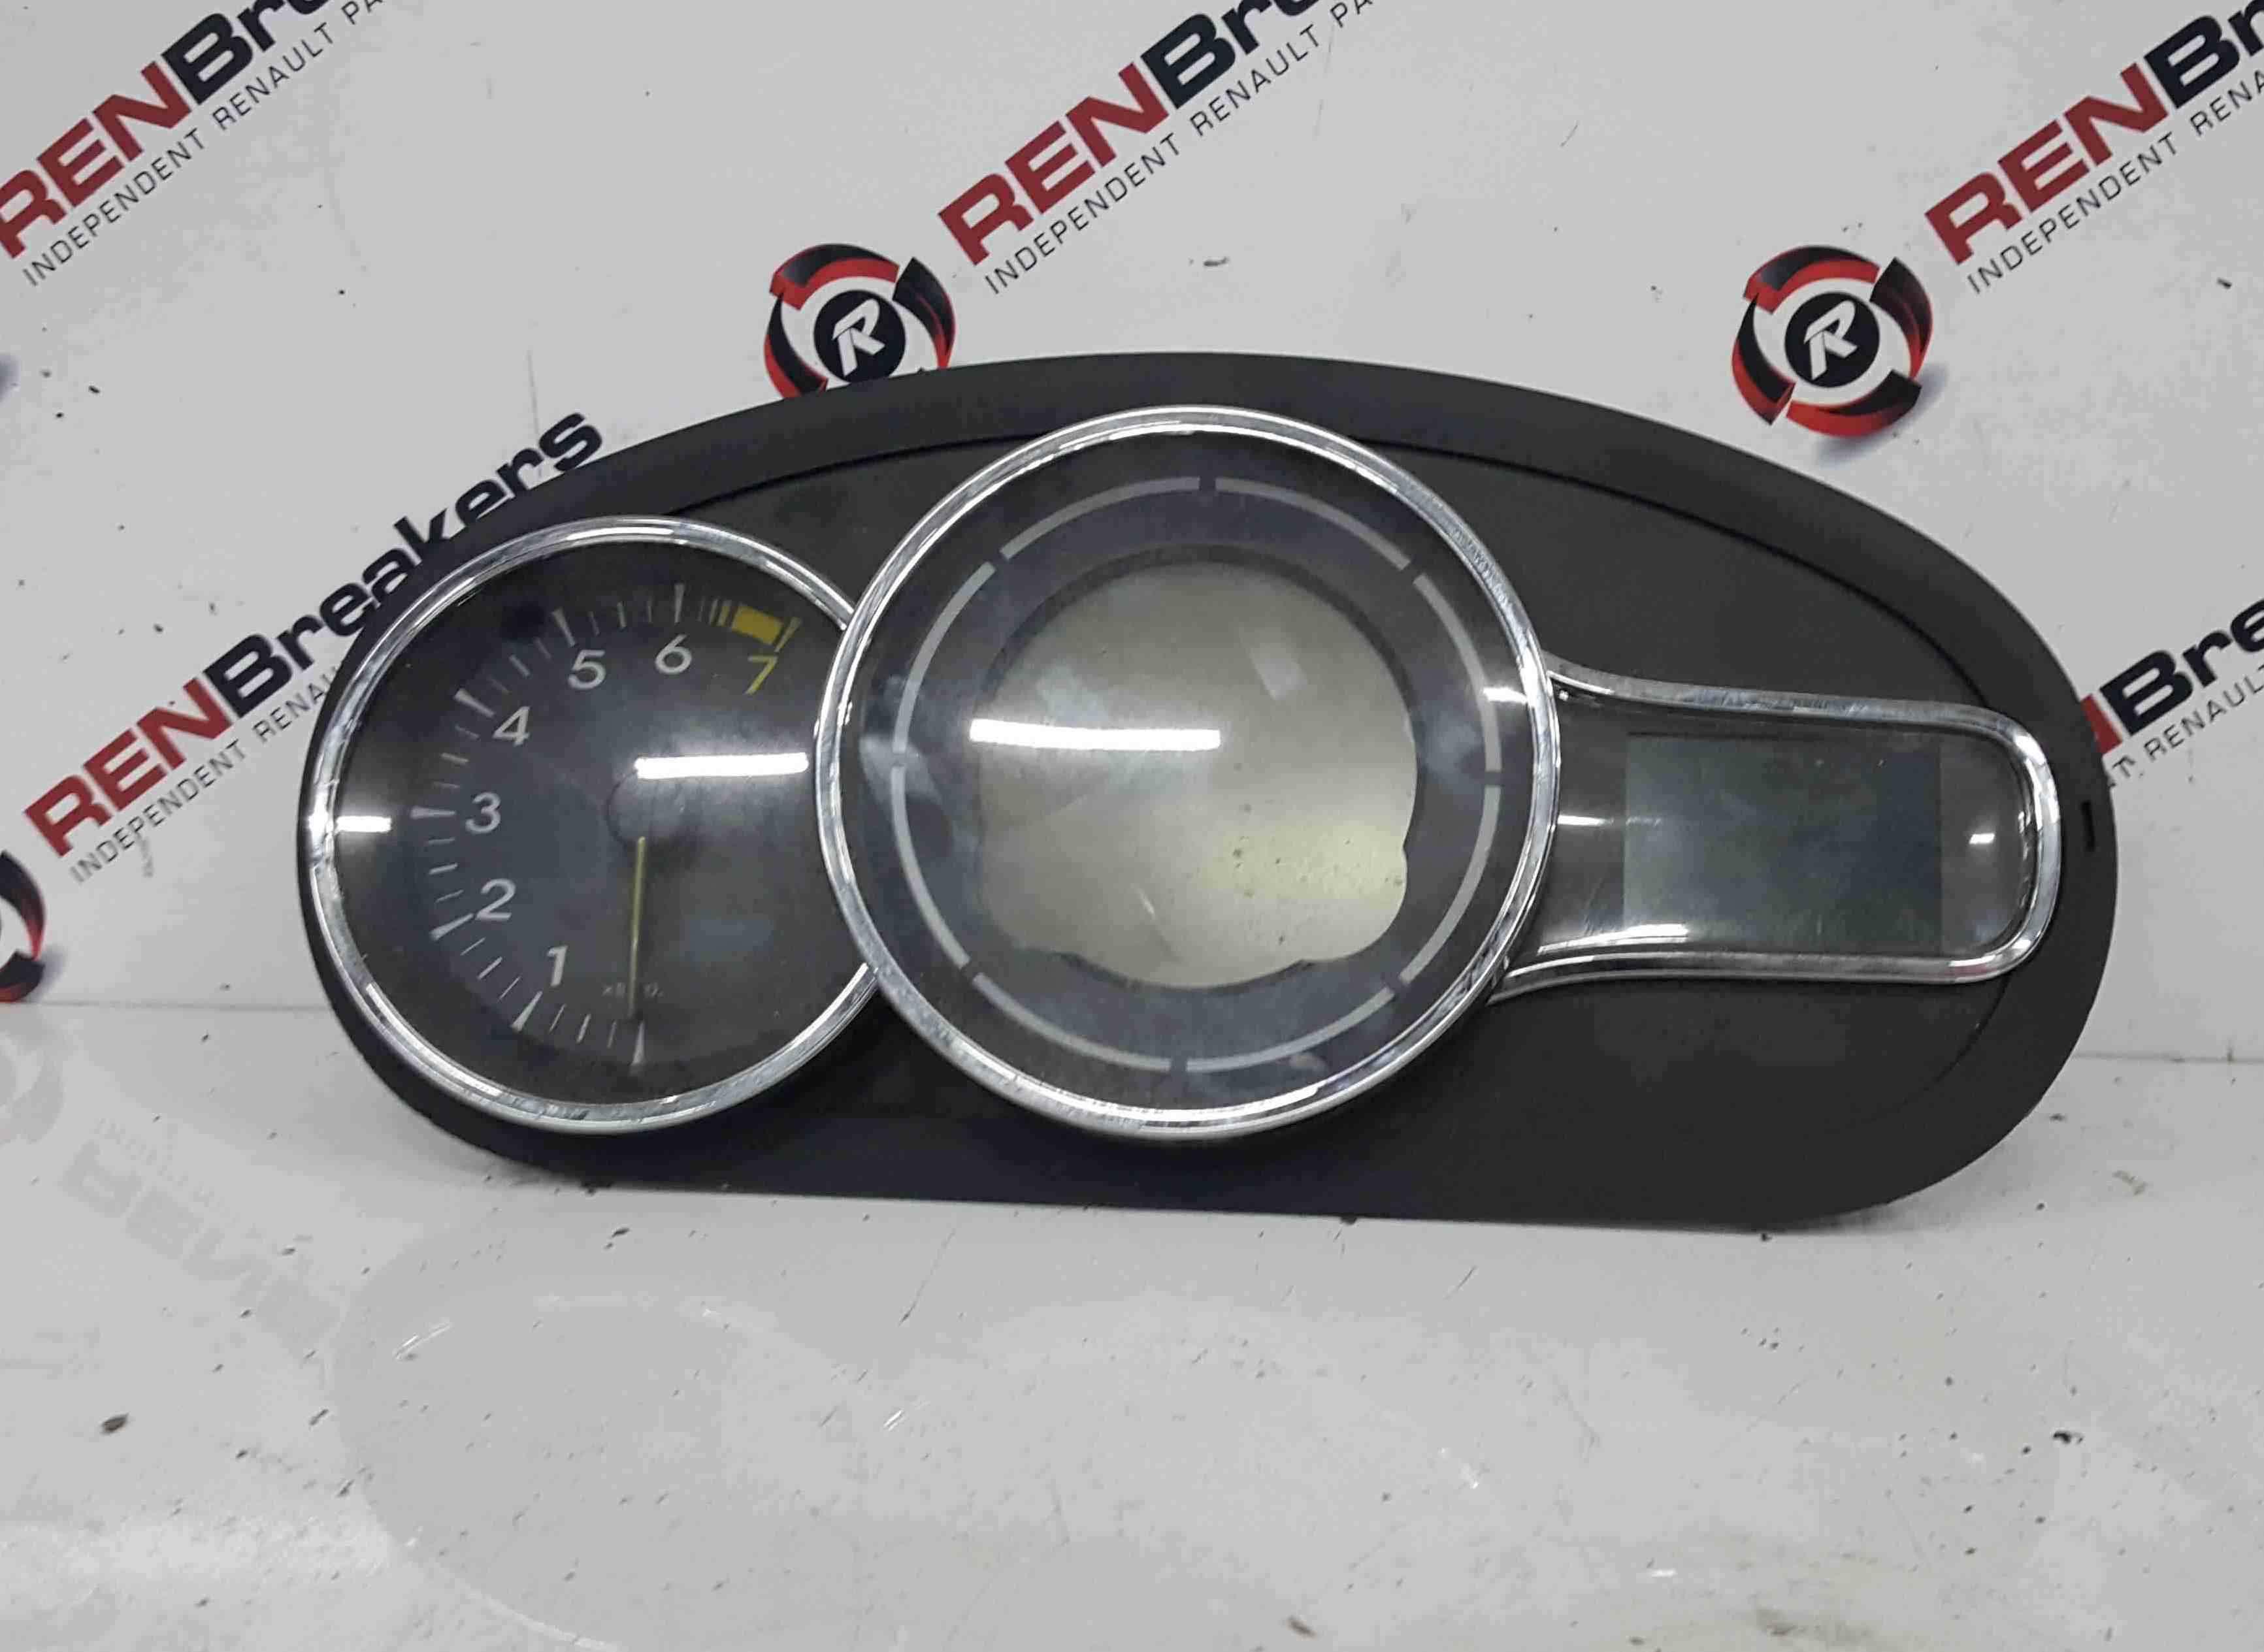 Renault Megane MK3 2008-2014 Instrument Panel Dials Clocks Speedo 248106944R